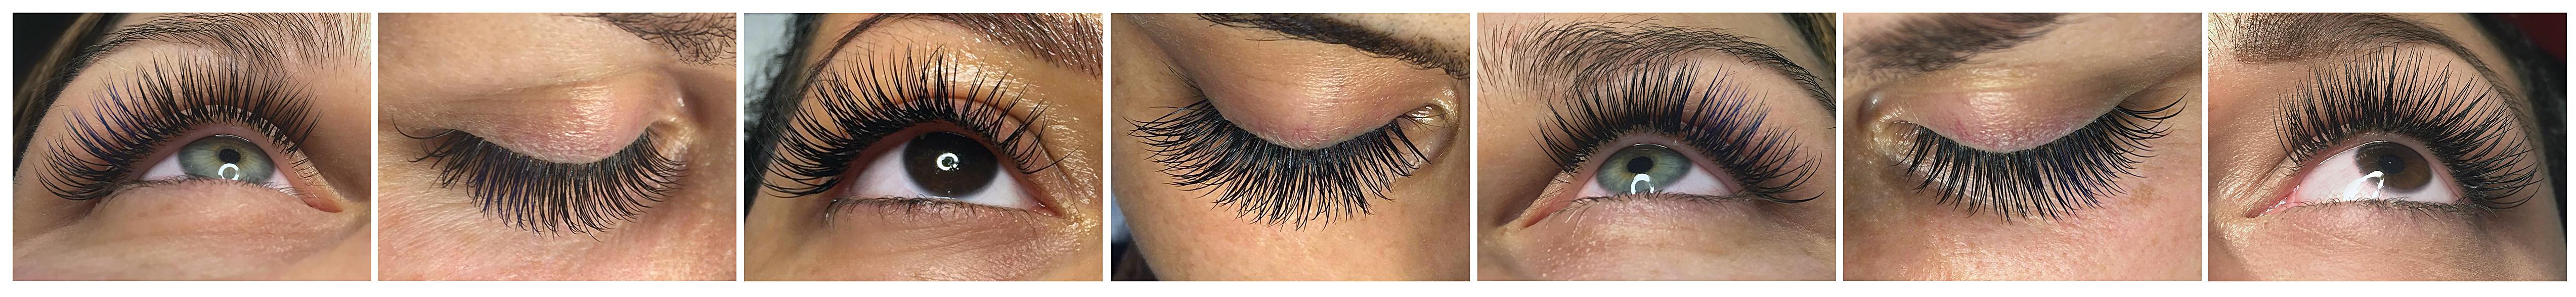 meget.lange.lashes.xenia. Eyelash extensions